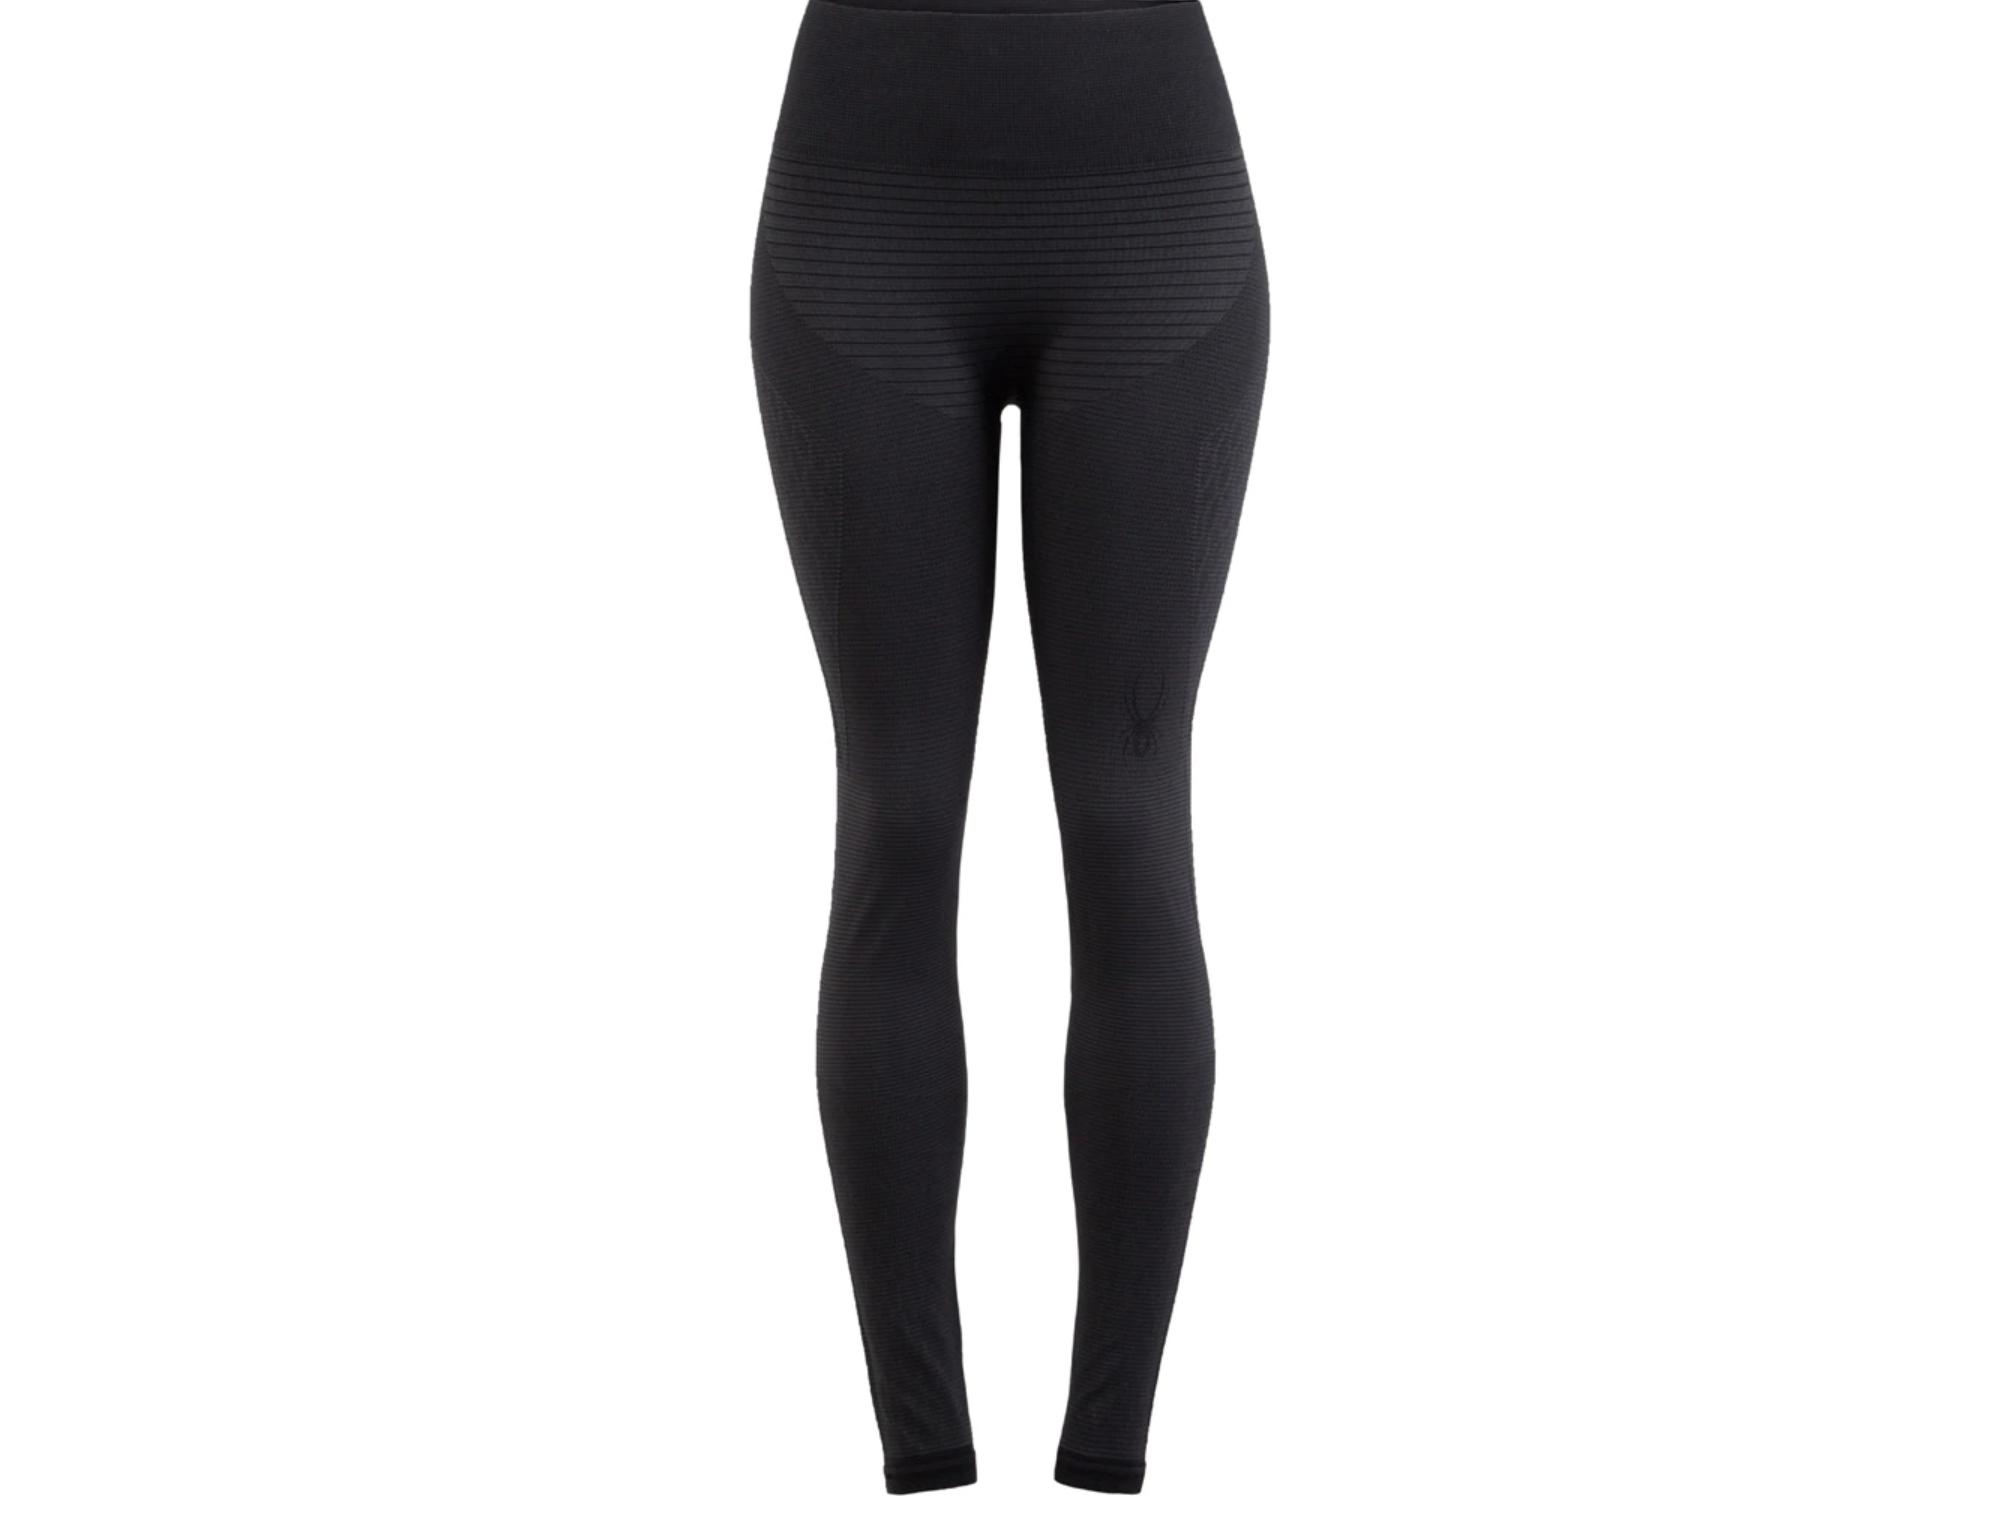 Pantalón térmico de mujer Momentum Spyder